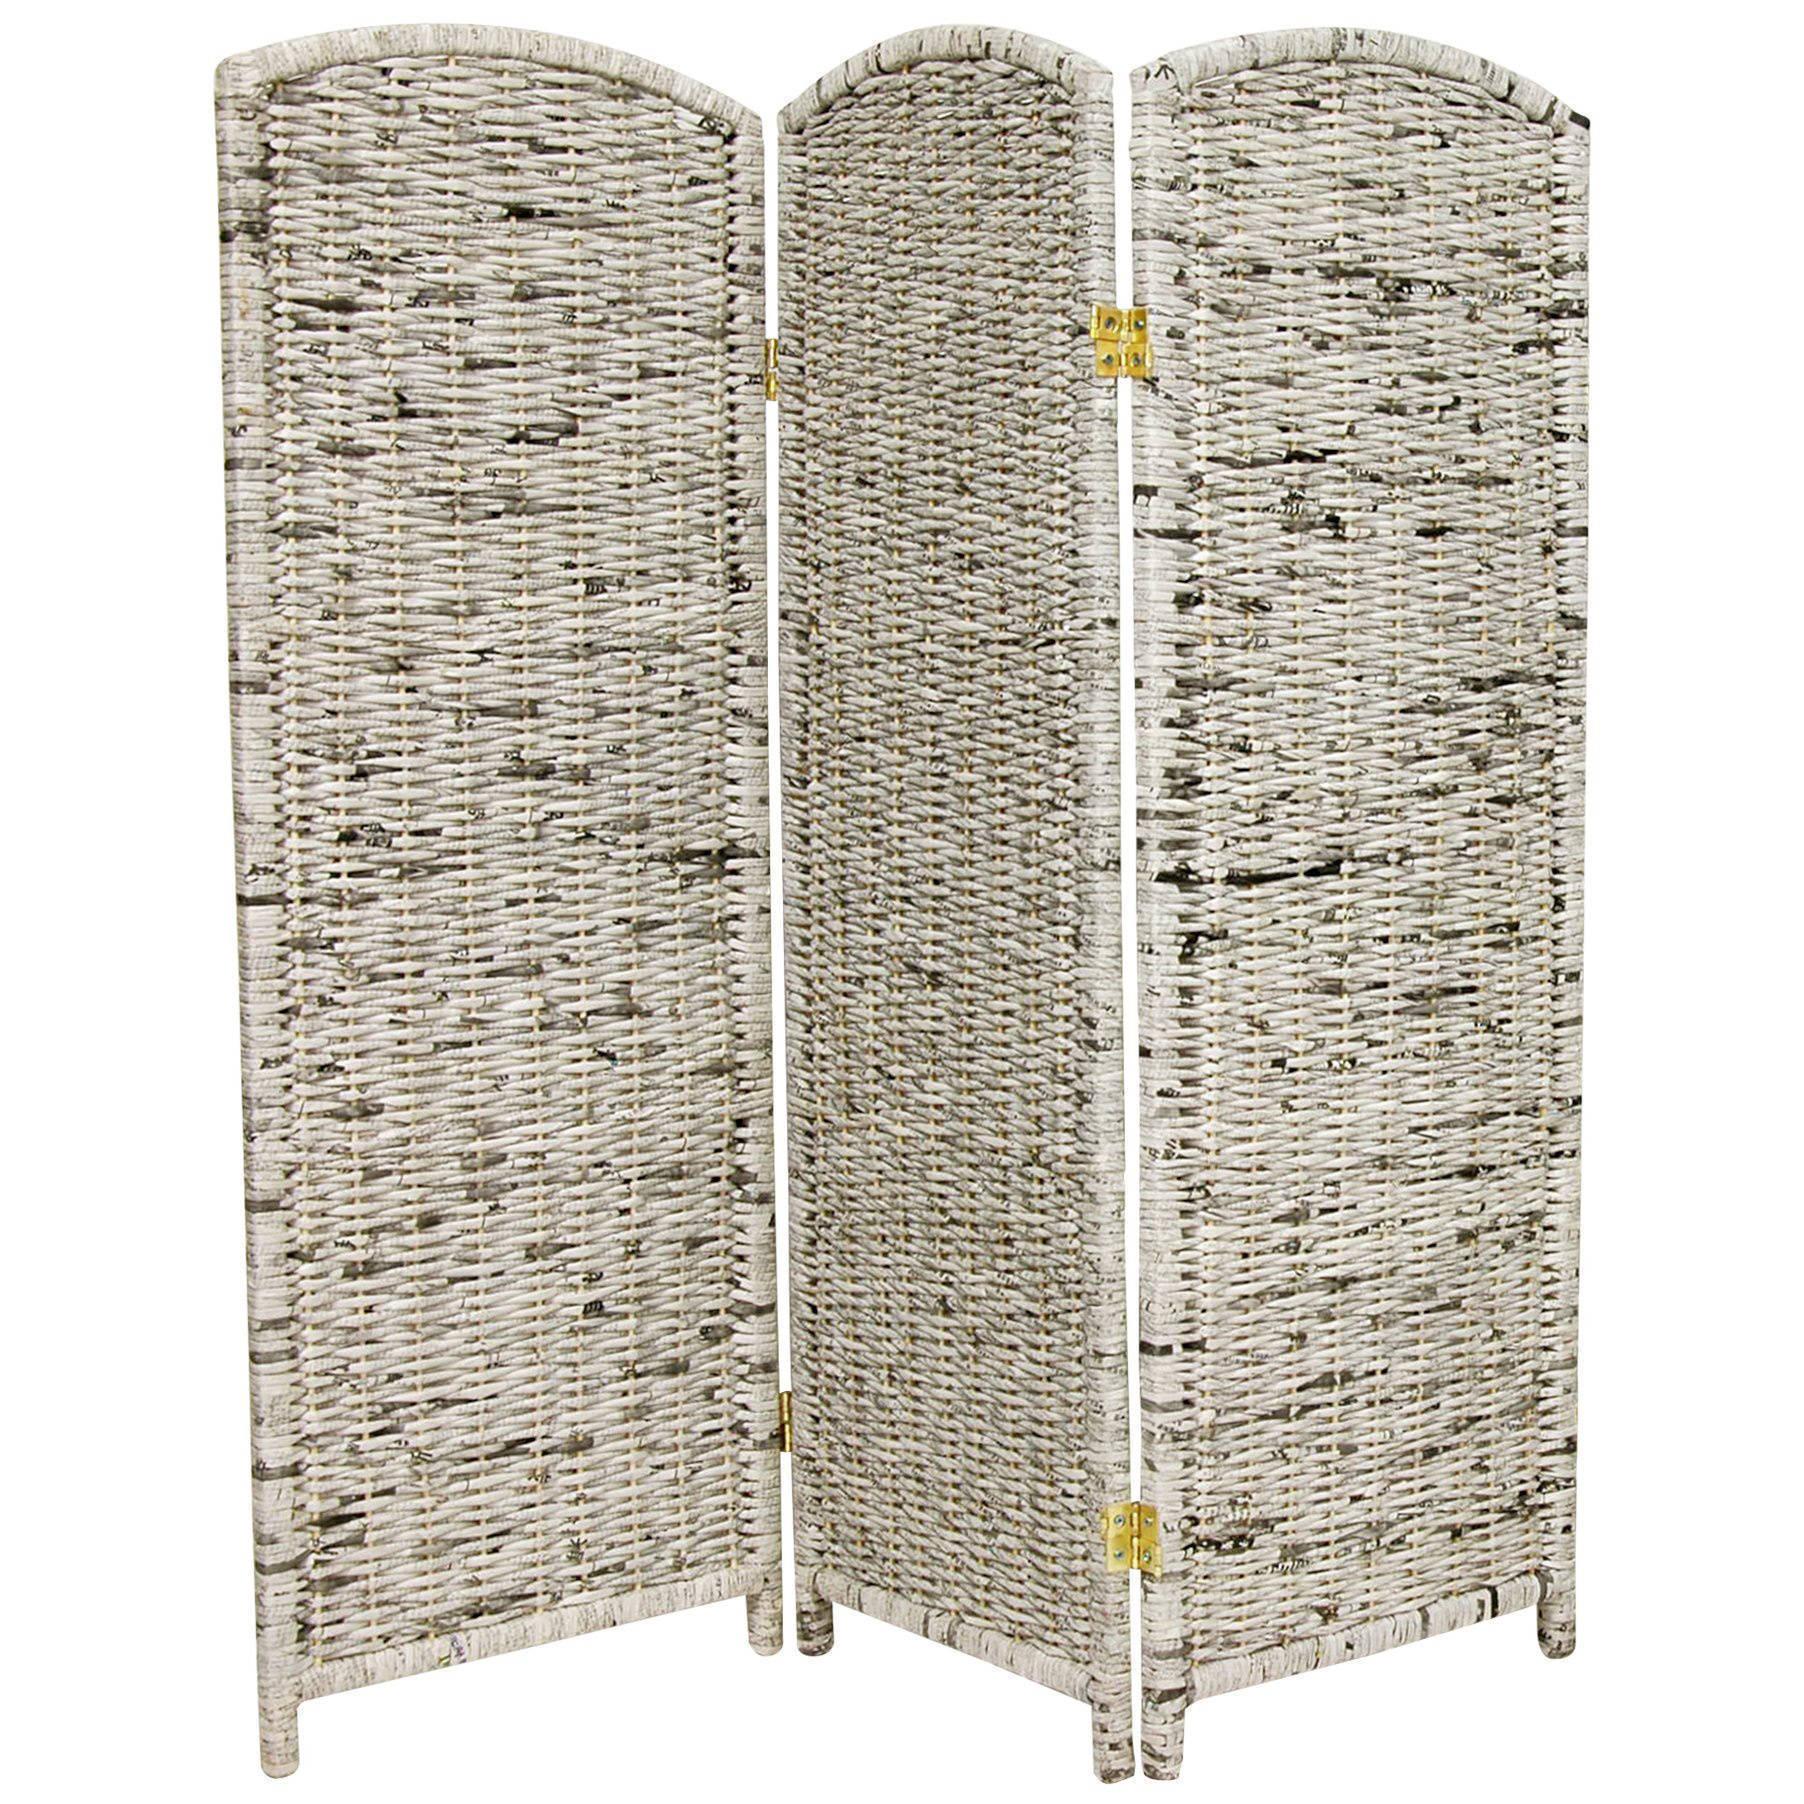 Shop Handmade Recycled Newspaper 4 Foot Tall Room Divider China